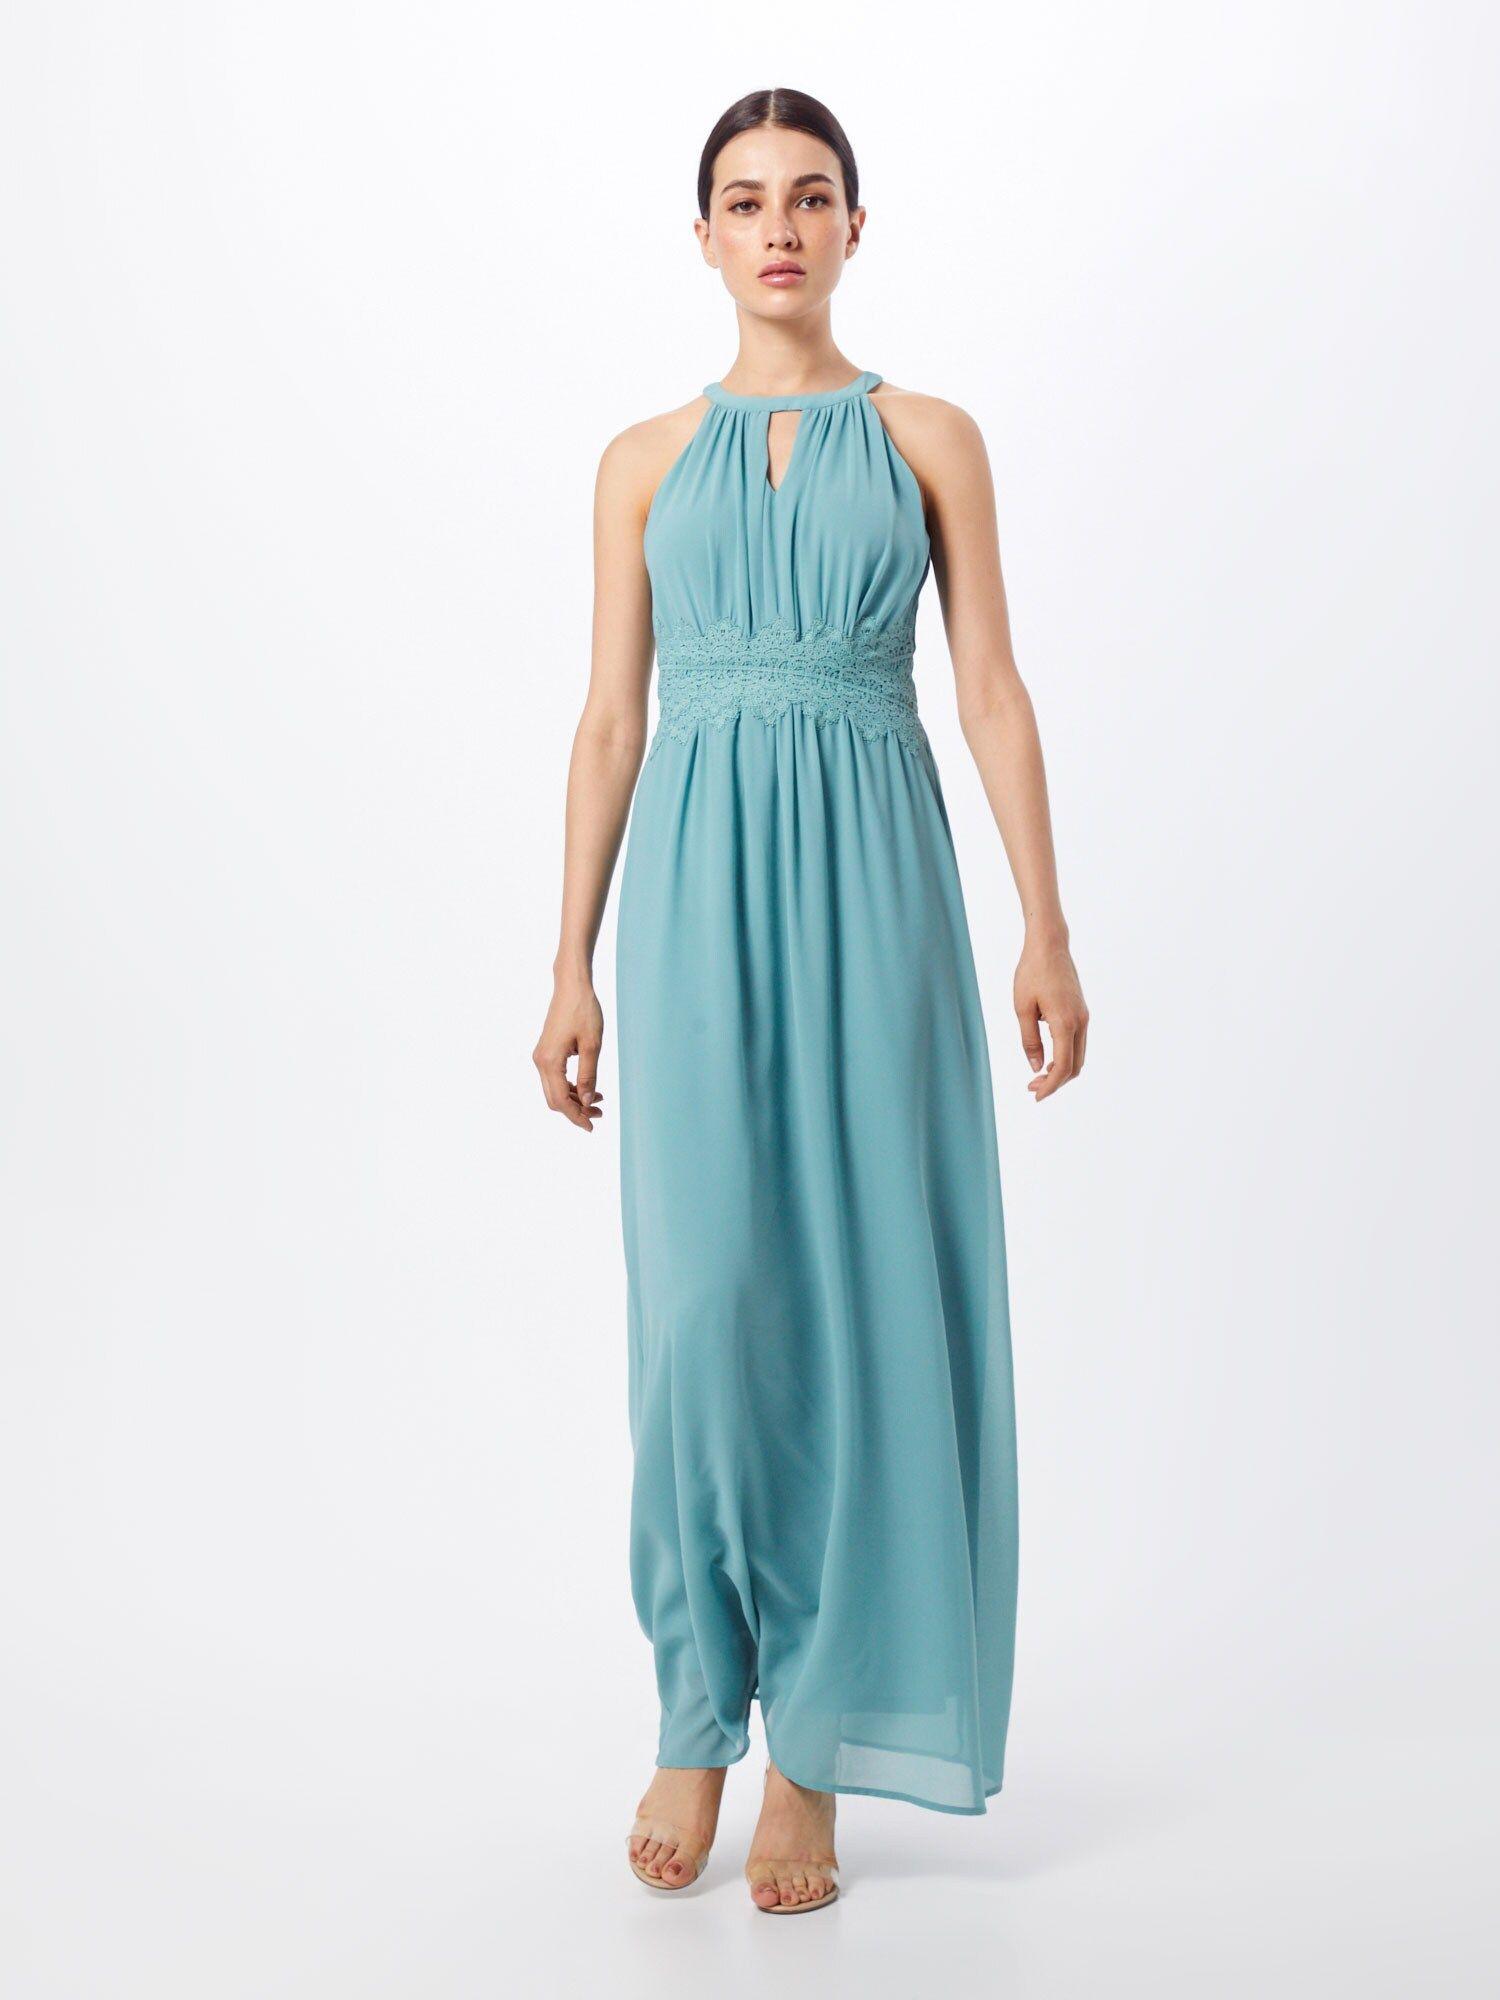 10 Fantastisch Vila Abendkleid Vertrieb10 Wunderbar Vila Abendkleid Spezialgebiet